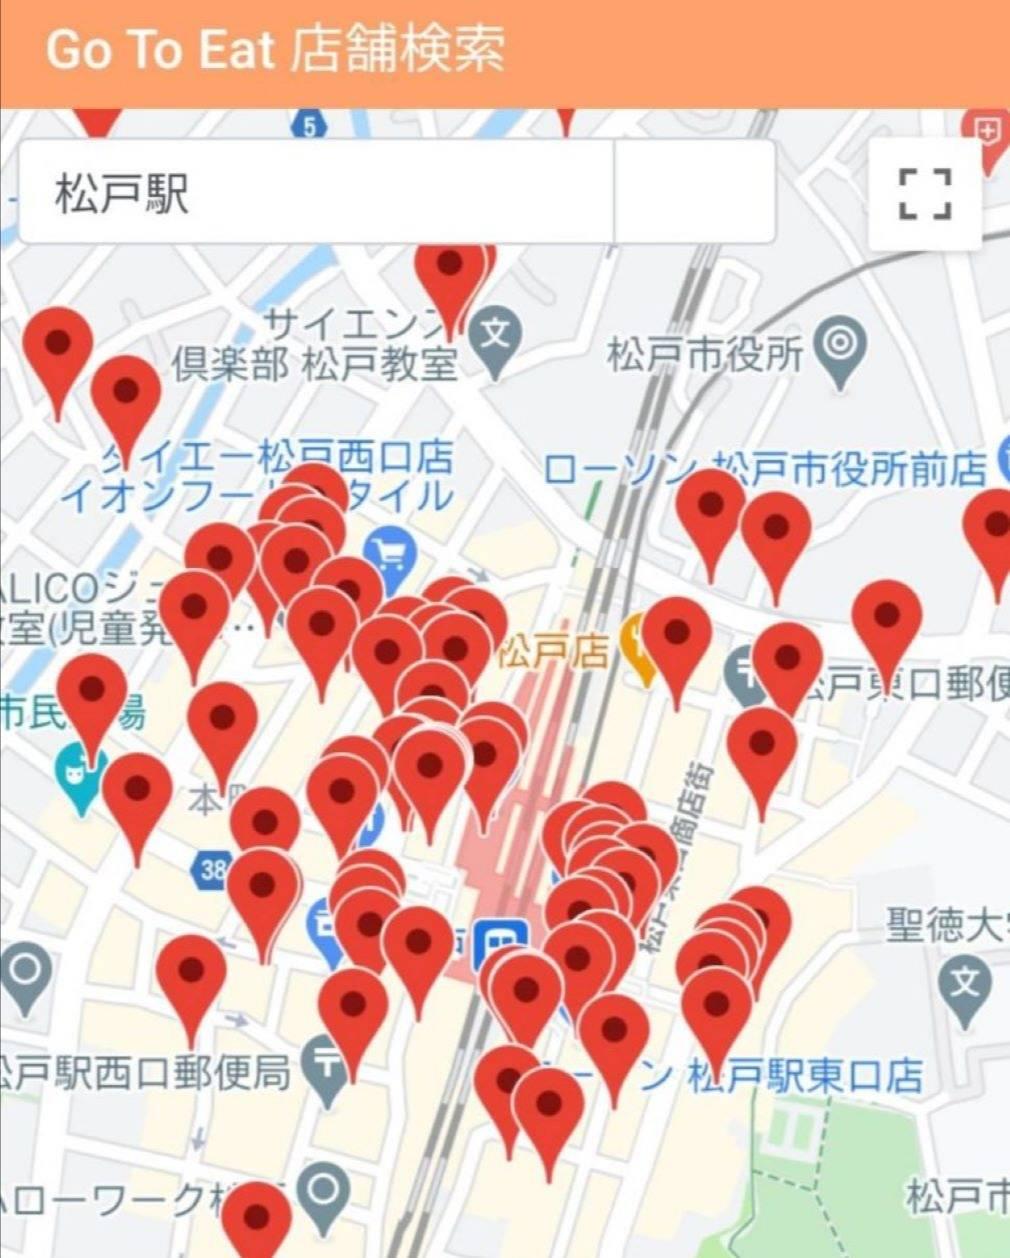 Go To Eat千葉県の加盟店検索が便利に・マップ一覧表示が公式で対応 ...